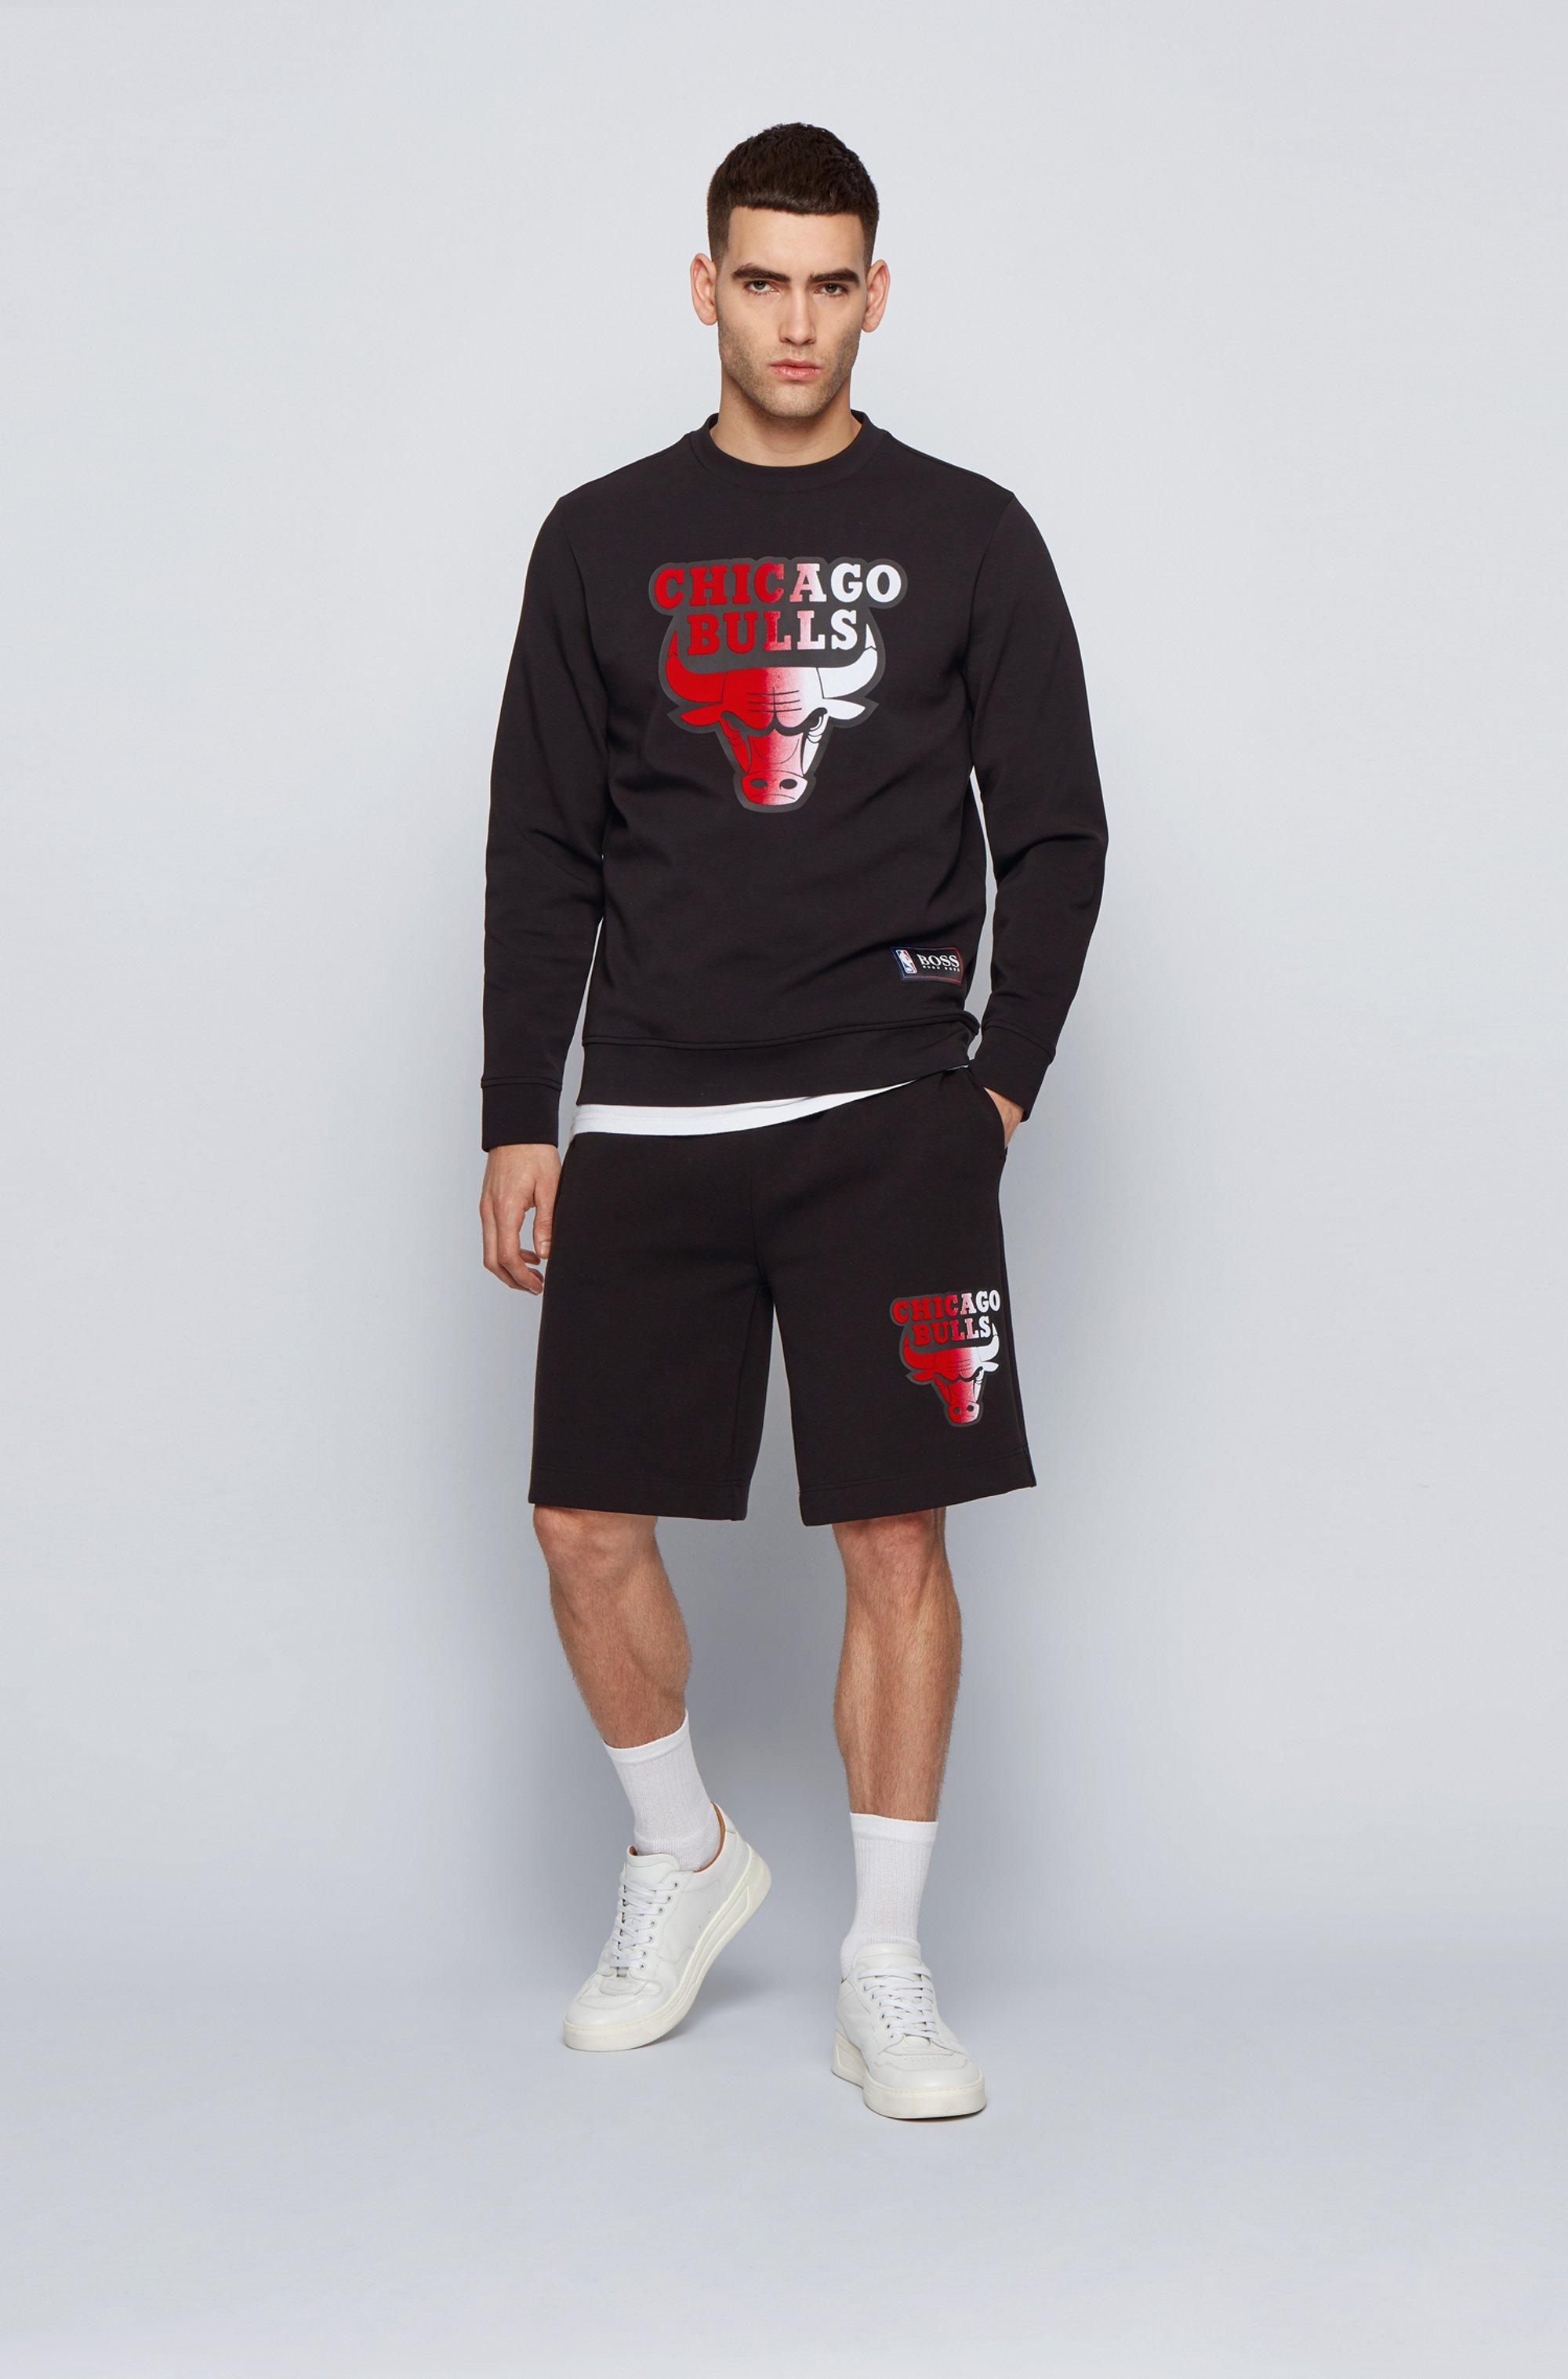 BOSS x NBA sweatshirt with team logo